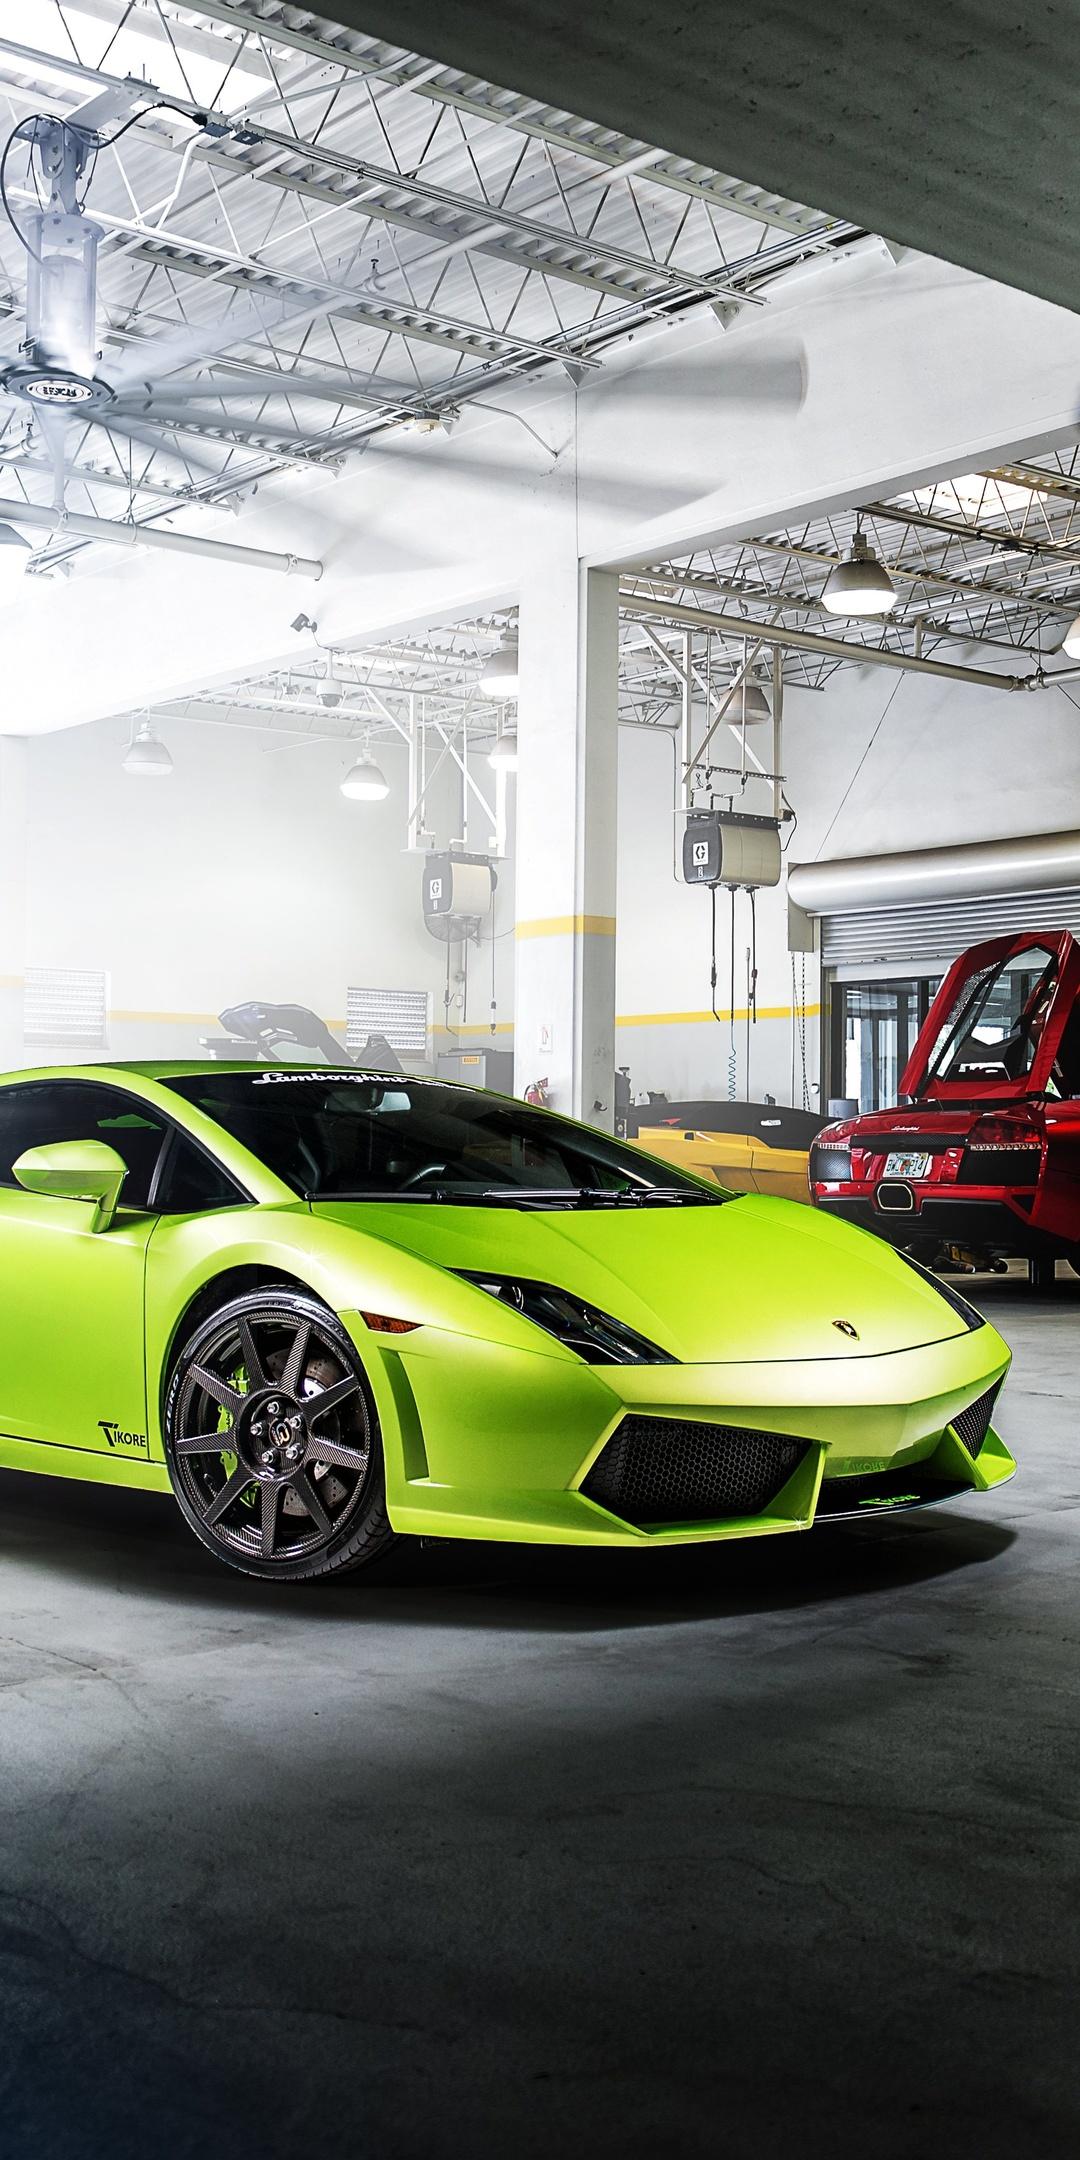 Lamborghini Aventador SVJ Roadster K Wallpaper HD Car